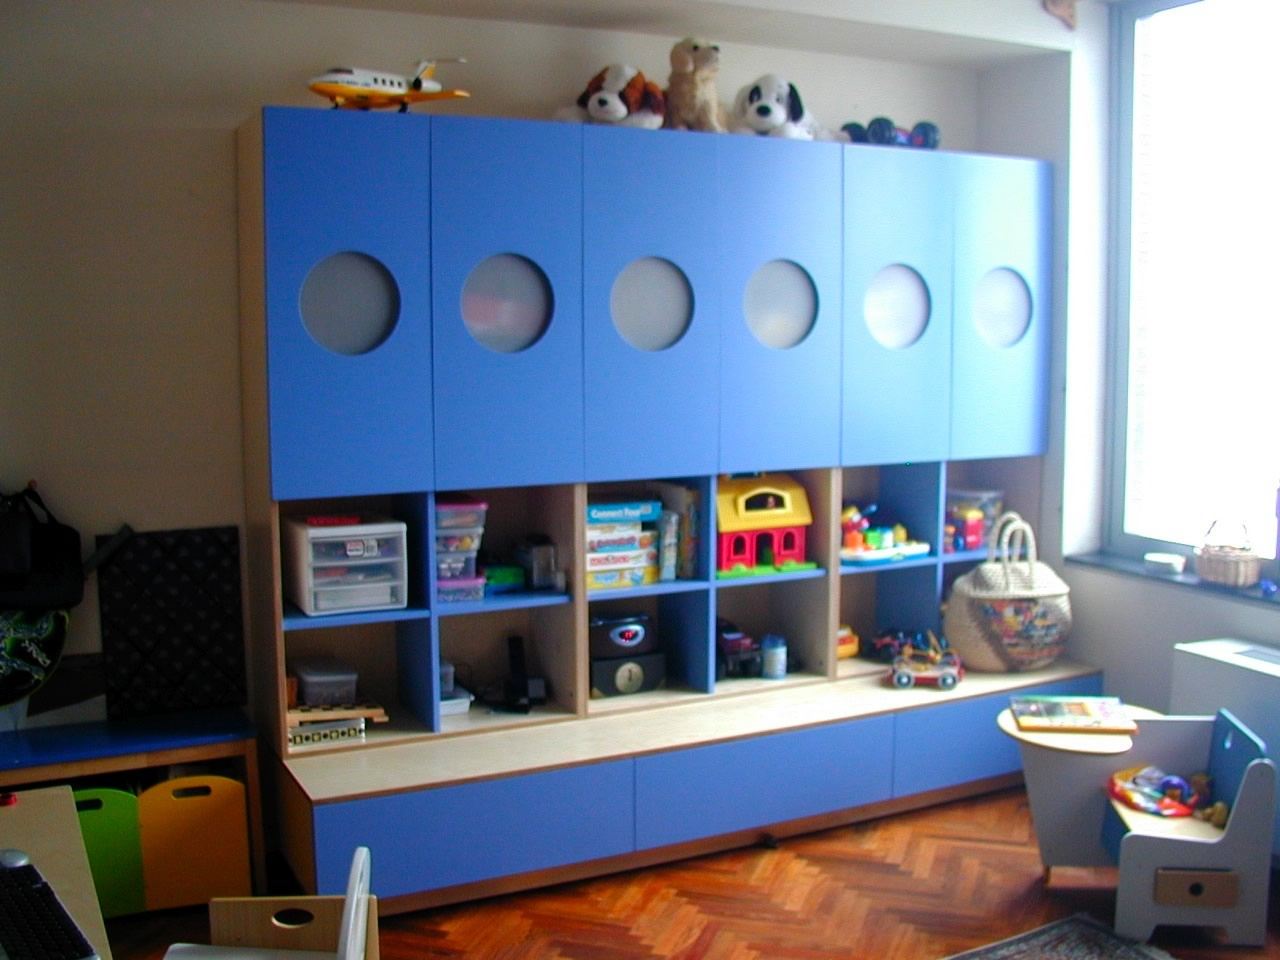 Casa kids muebles minimalistas para ni os decototal for Pegatinas infantiles para muebles